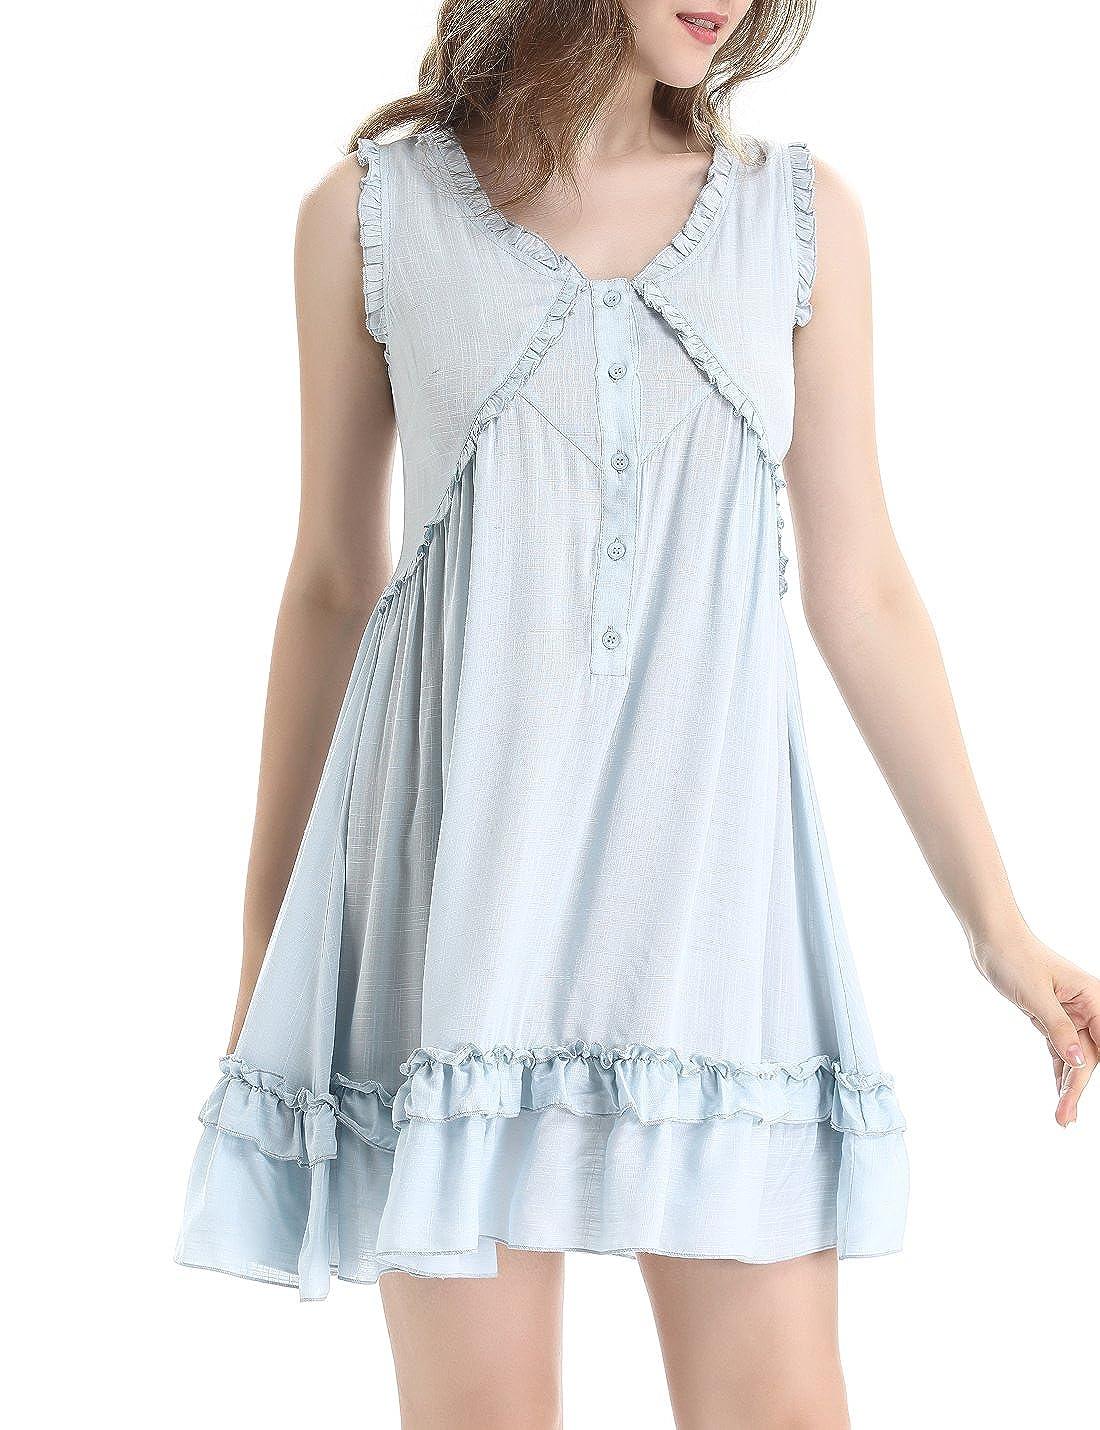 8478523553ea NORA TWIPS Ladies Summer Nightwear, Nighties, Sleeveless Nightgown Women,  Victorian Vintage Nightshirt Sleepwear, Button Front Nightdress:  Amazon.co.uk: ...